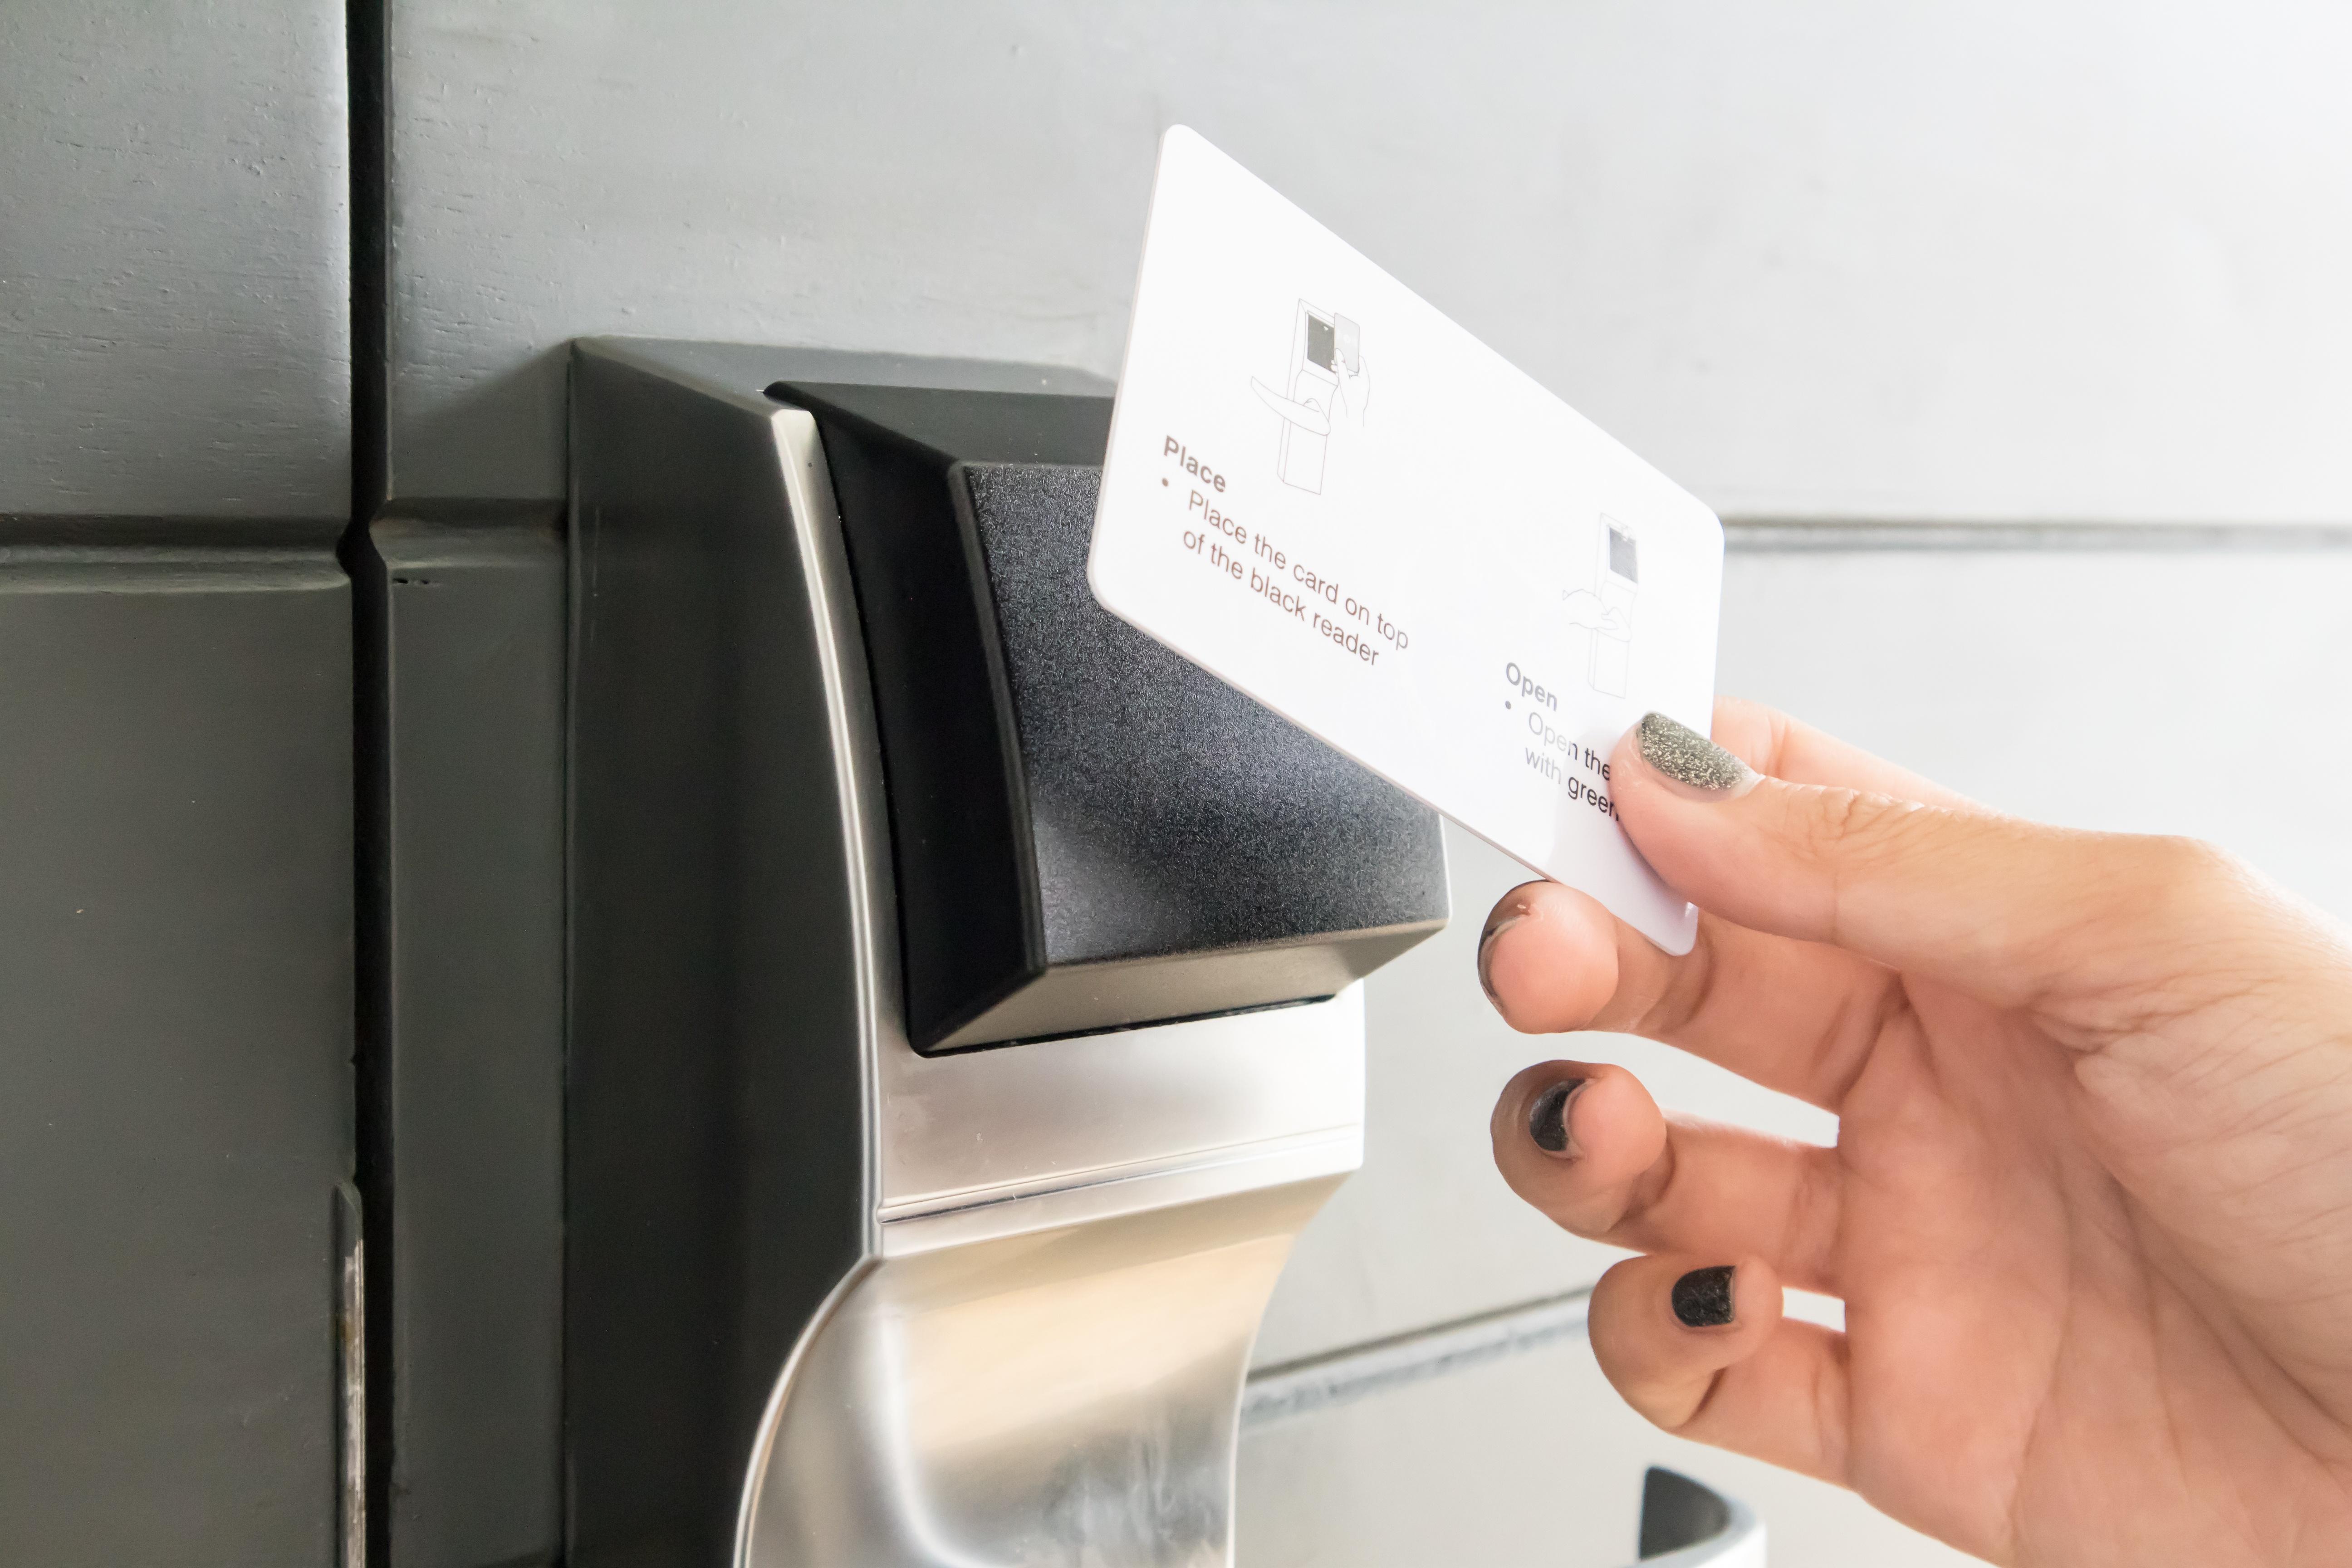 Access control card.jpg